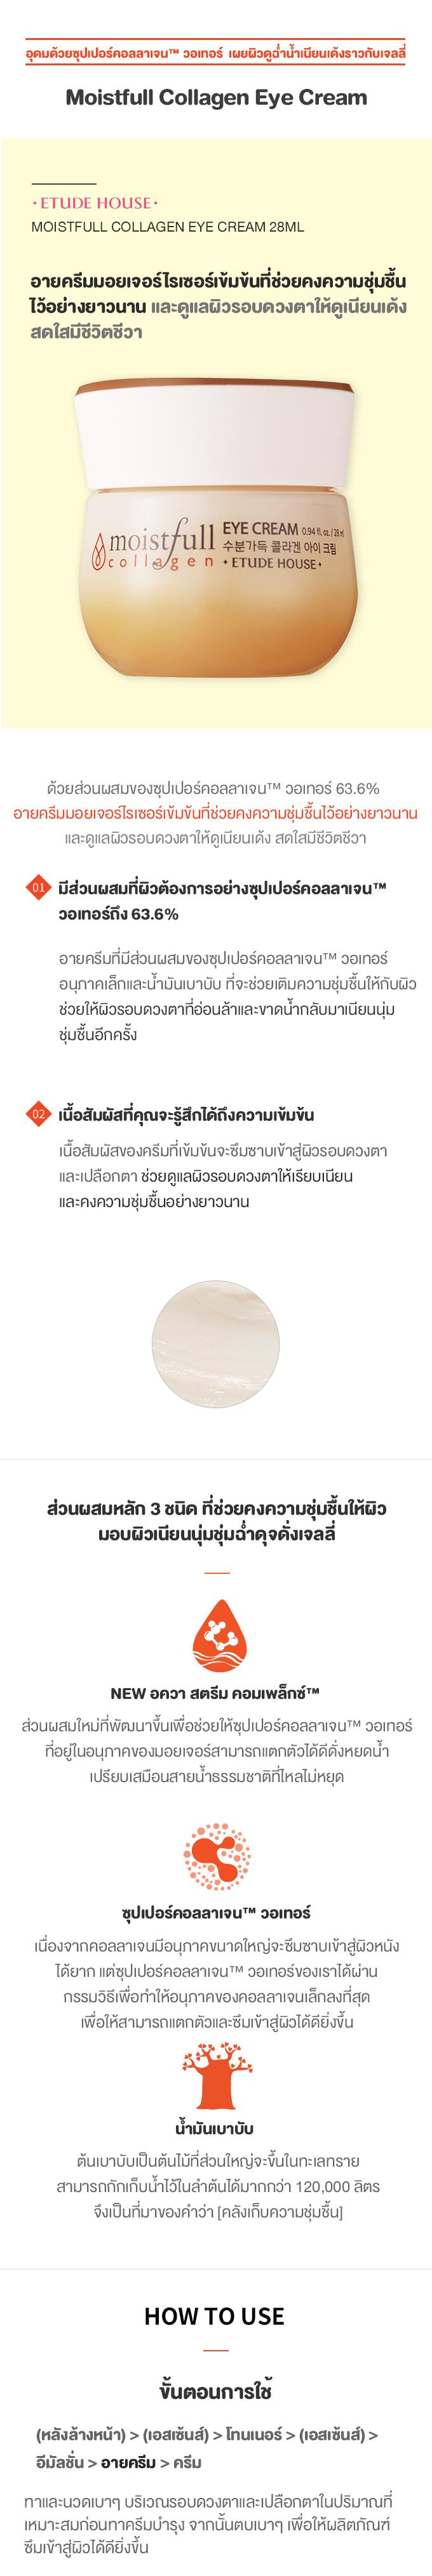 1TH_Moistful-Collagen-Eye-Cream_w